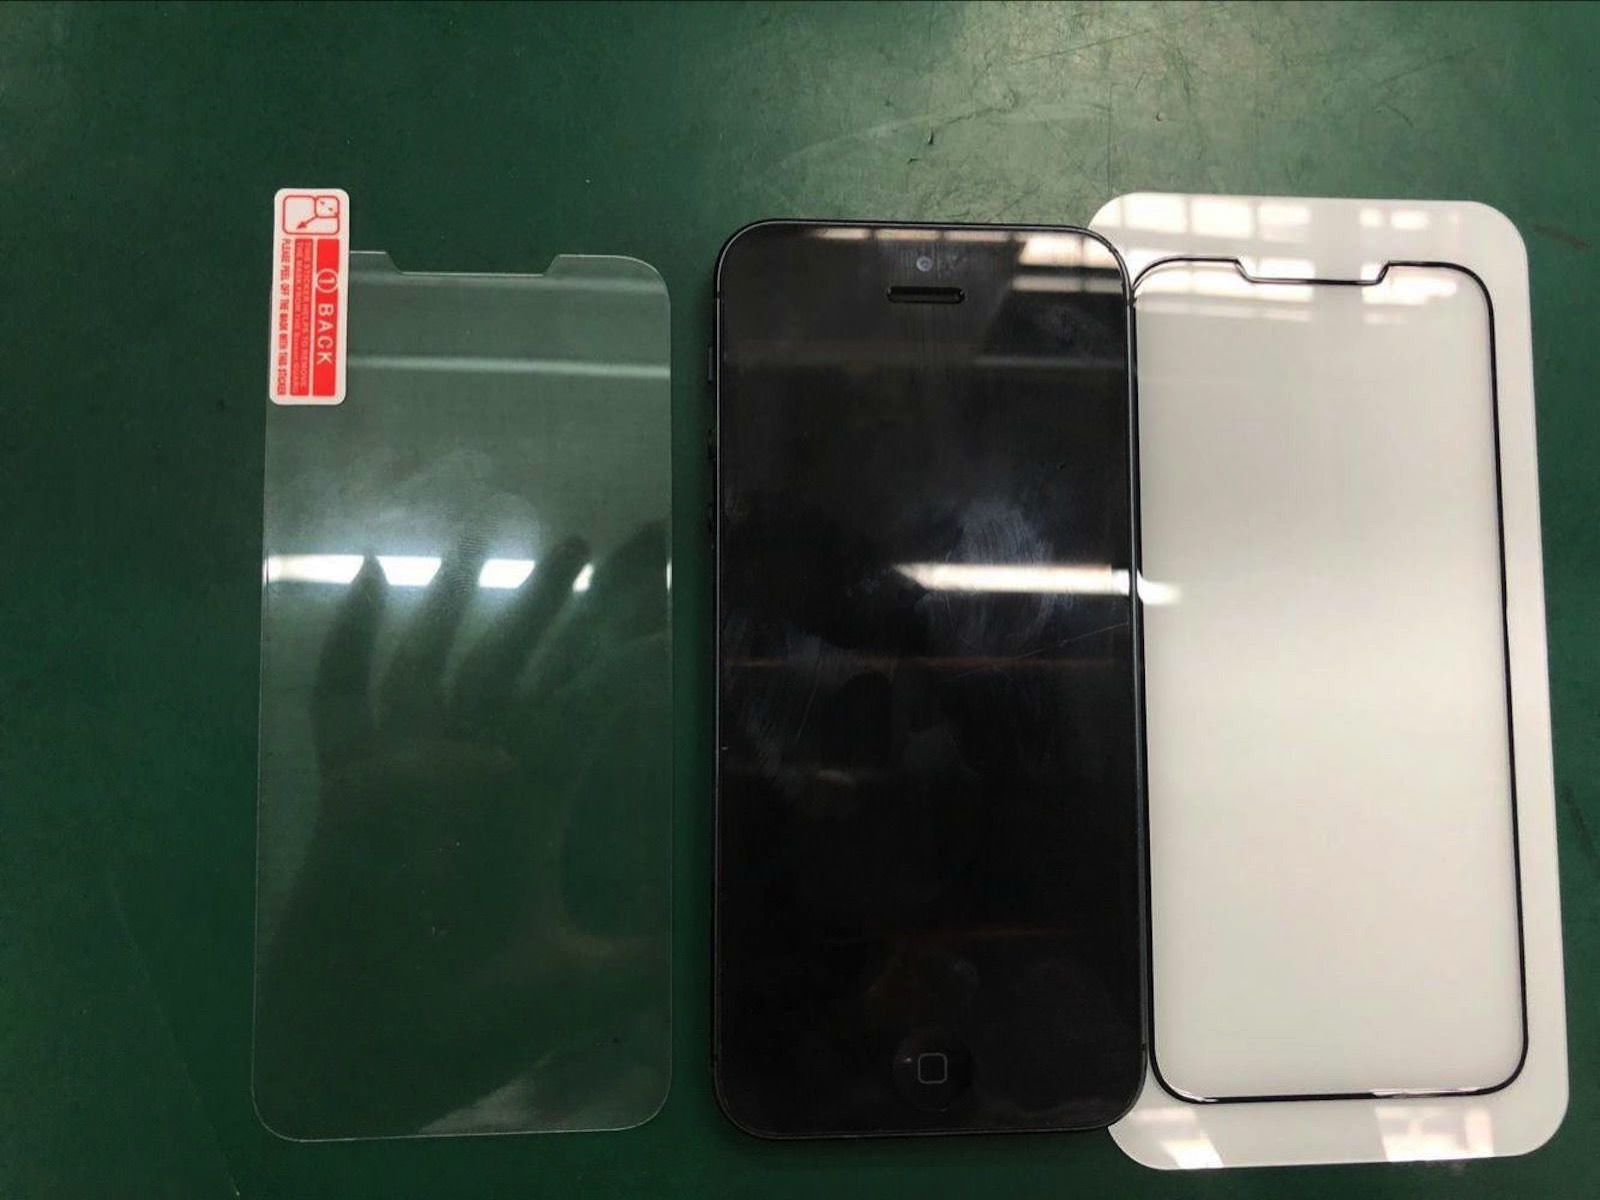 iphone-se-2-2018-factory-photos.jpg